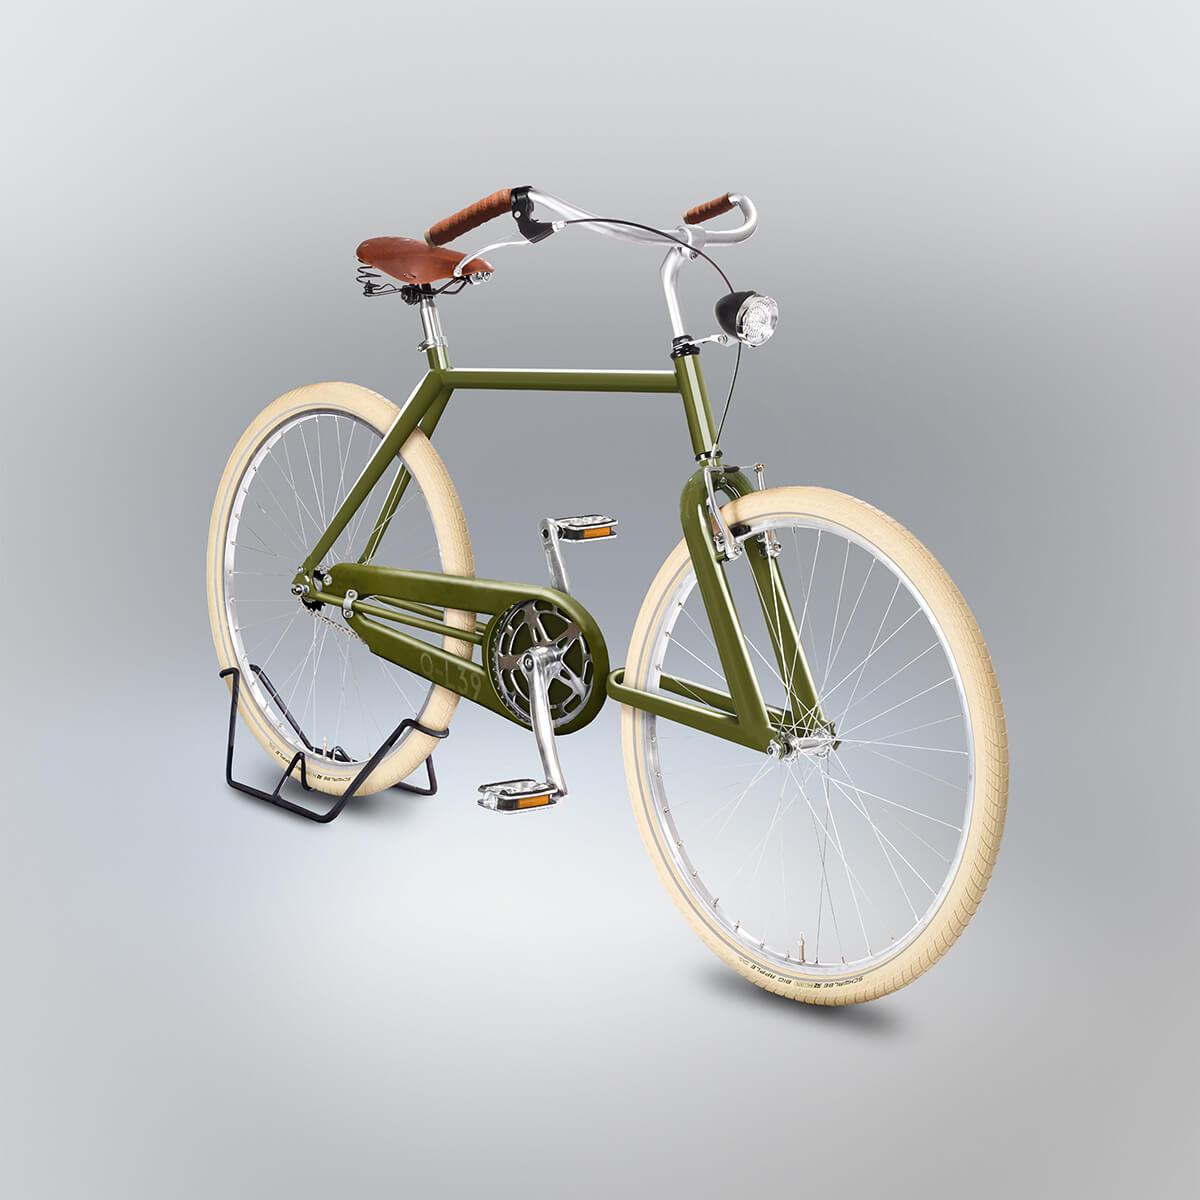 gianluca-gimini-bikes-18